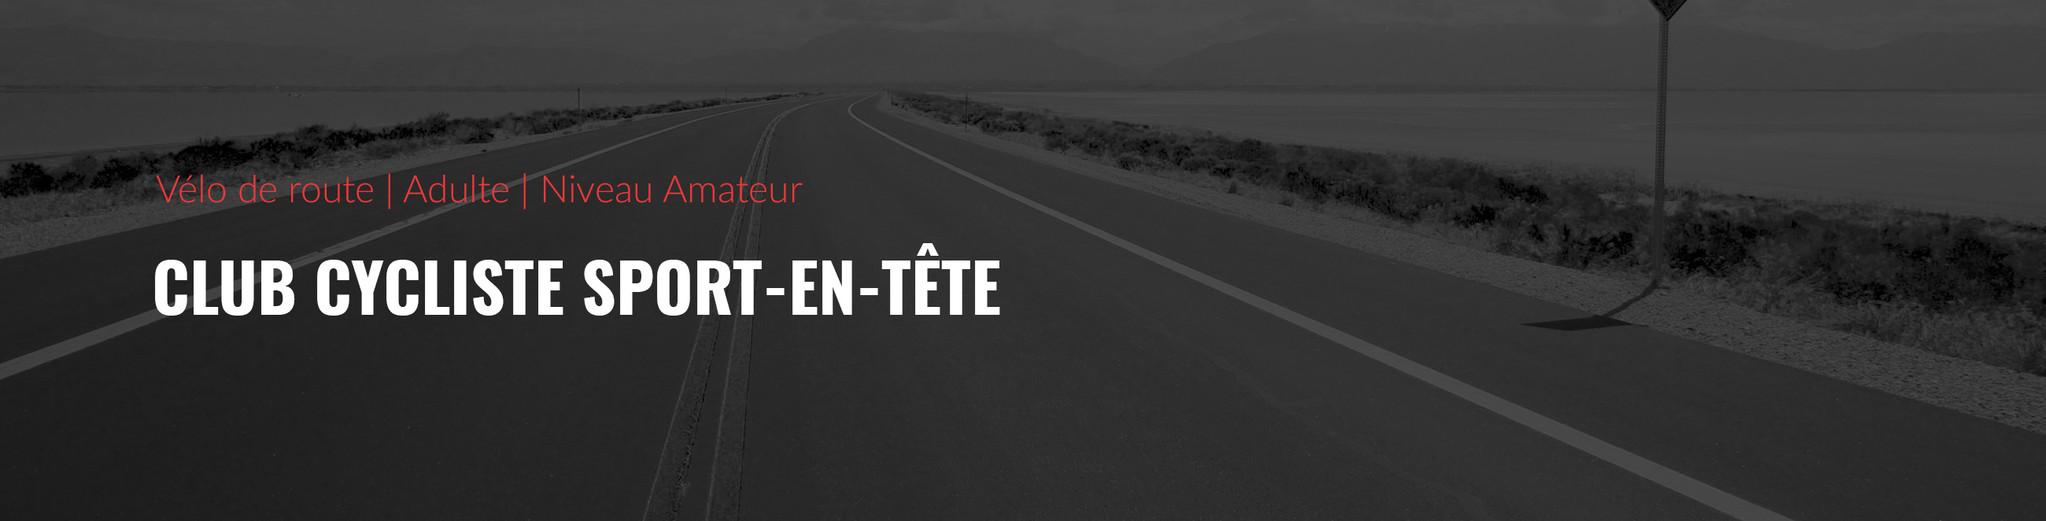 Club Cycliste Sport-En-Tête